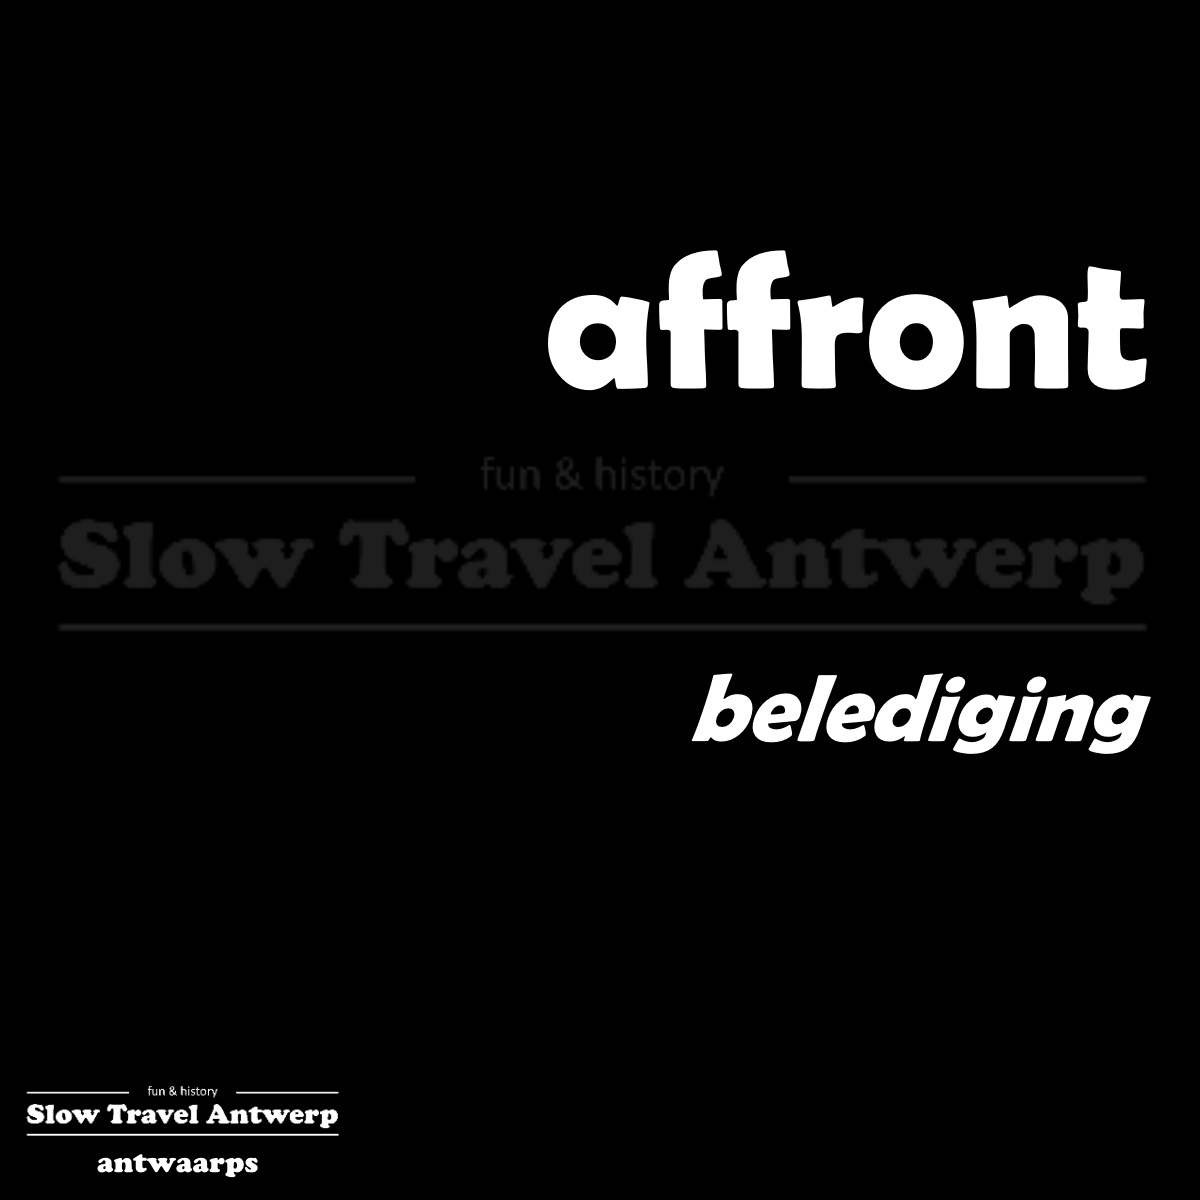 affront – belediging – indignity